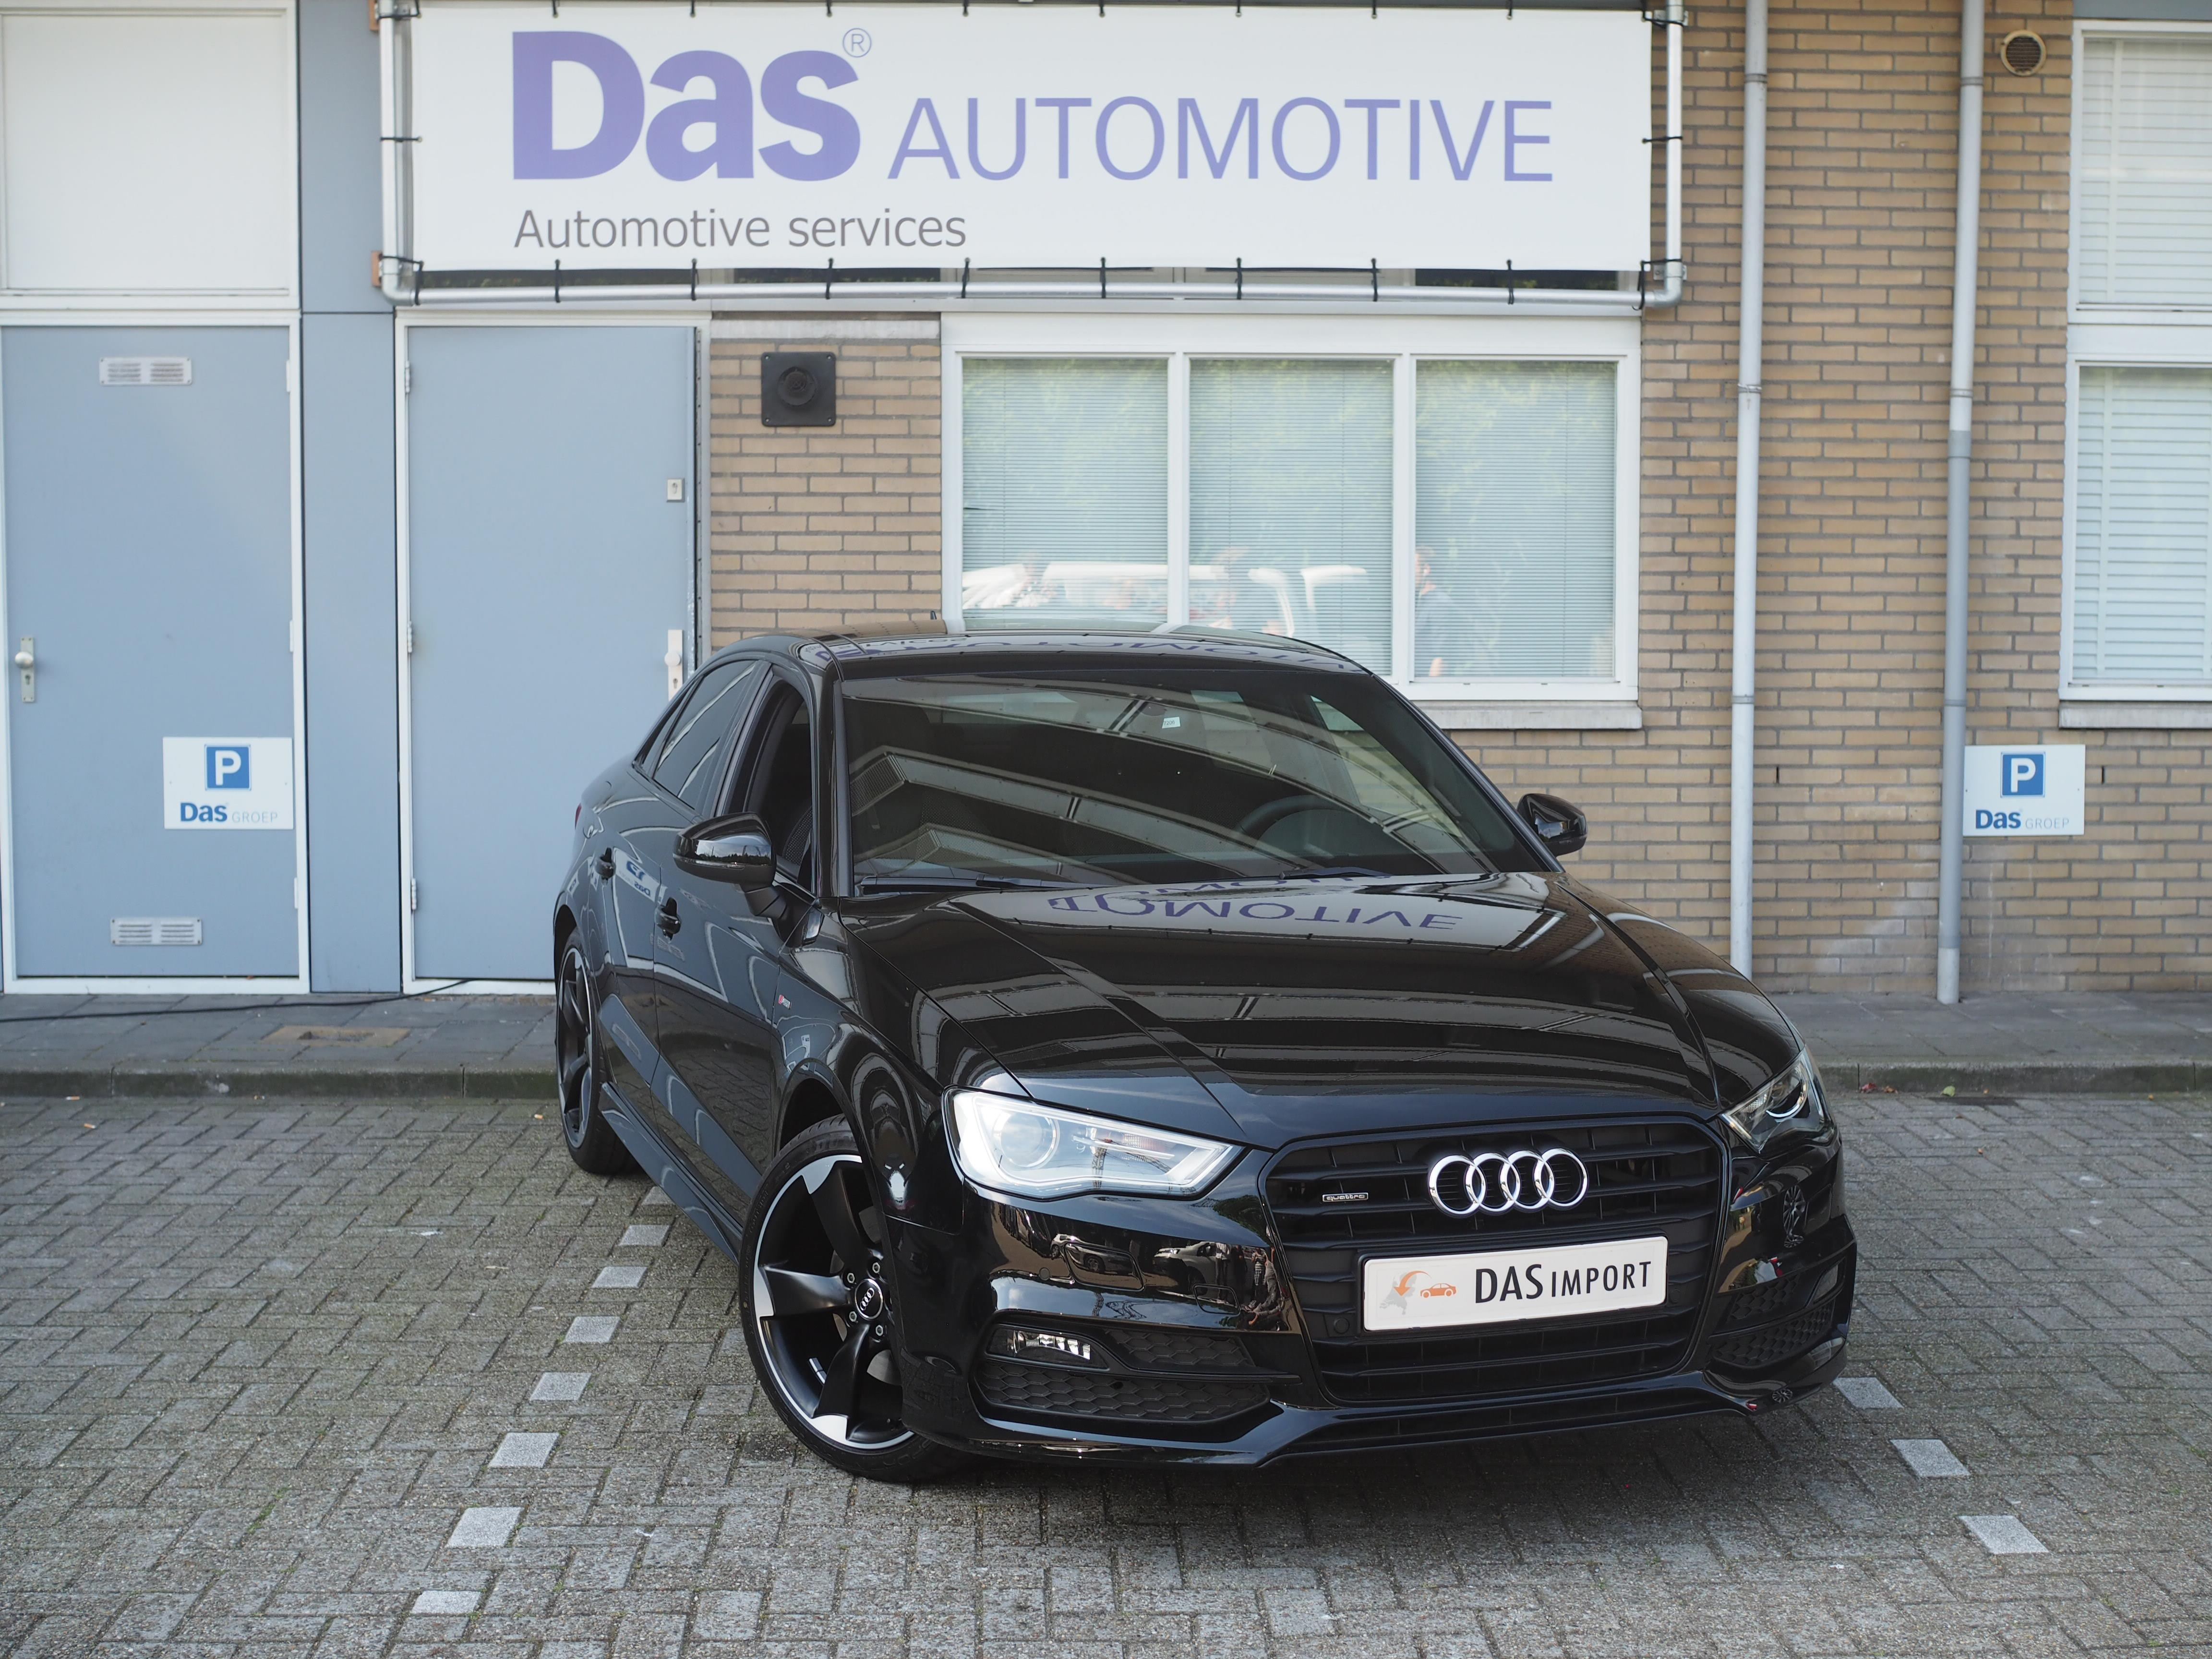 Importauto: Audi A3 Sedan 1.8 TFSI Ambition quattro S tronic 9/2015